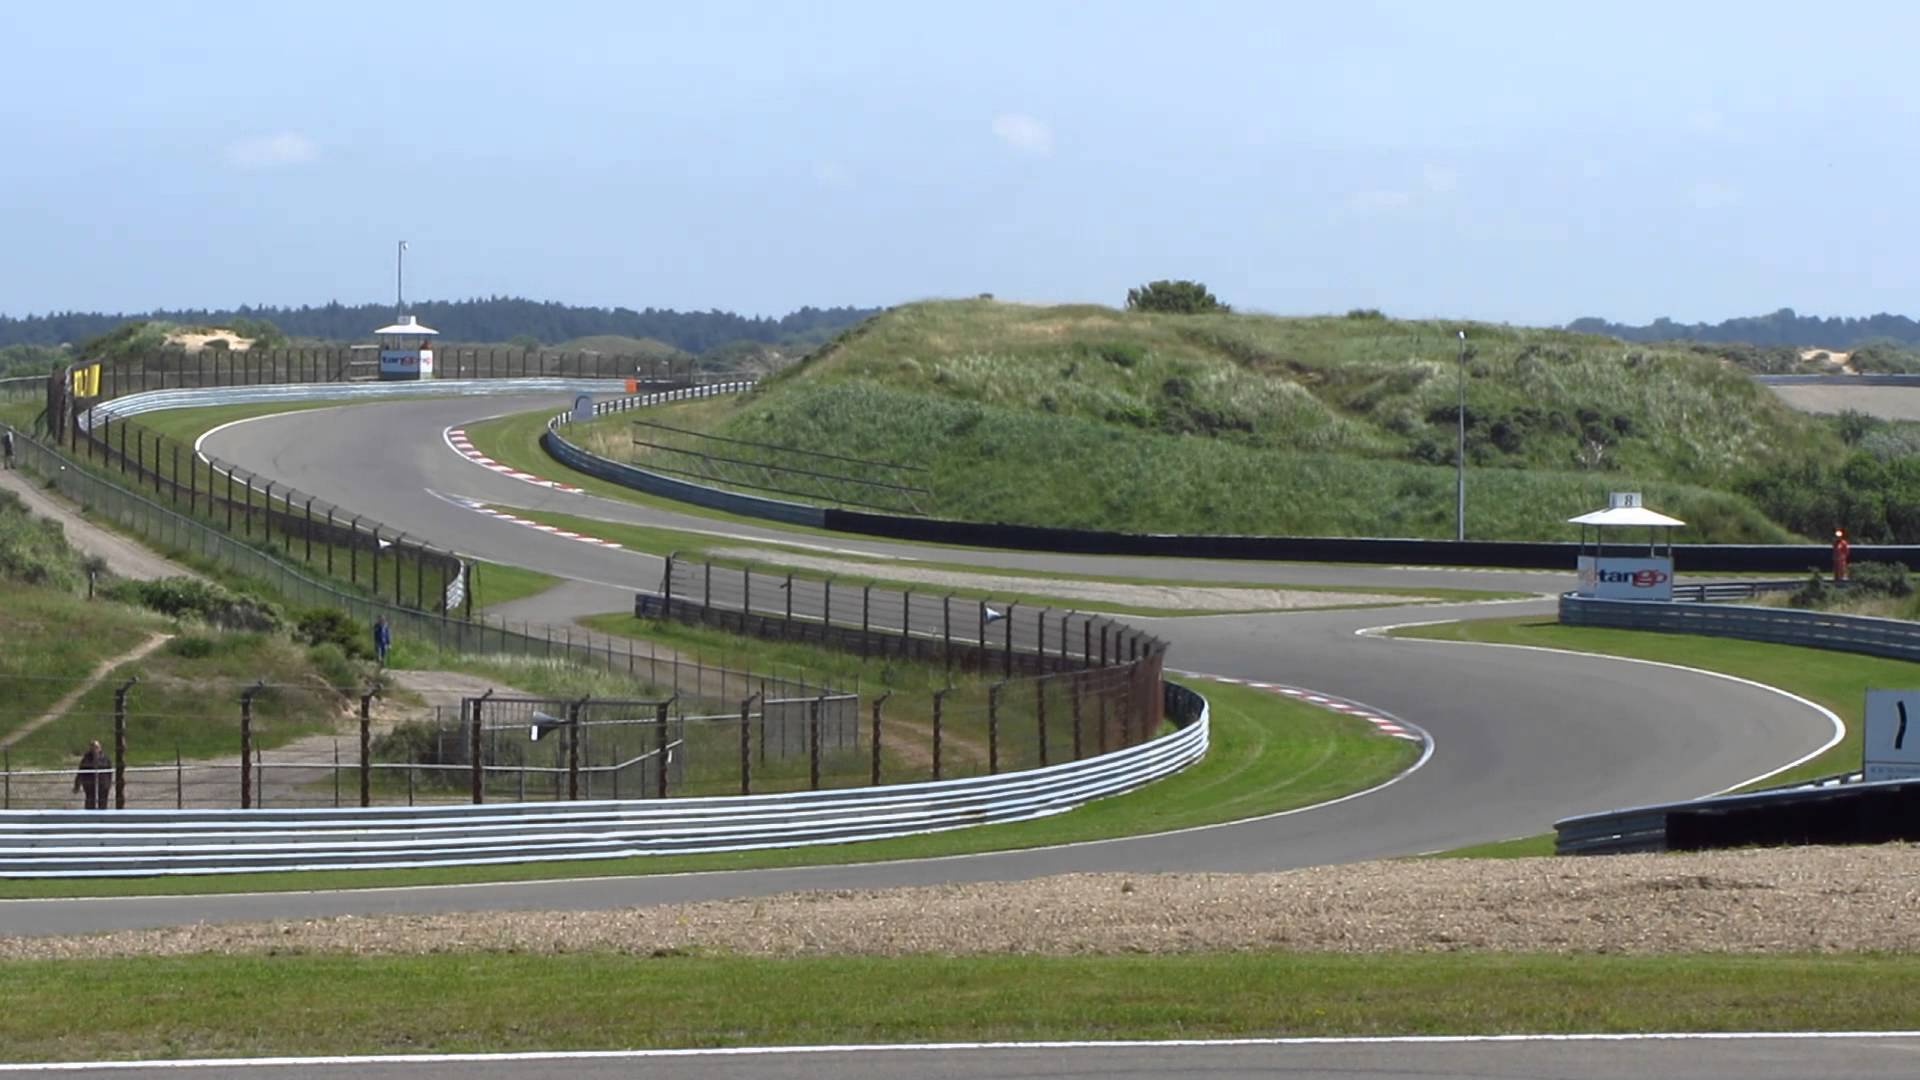 Circuito Zandvoort : Zandvoort trackday grand prix layout tracktime